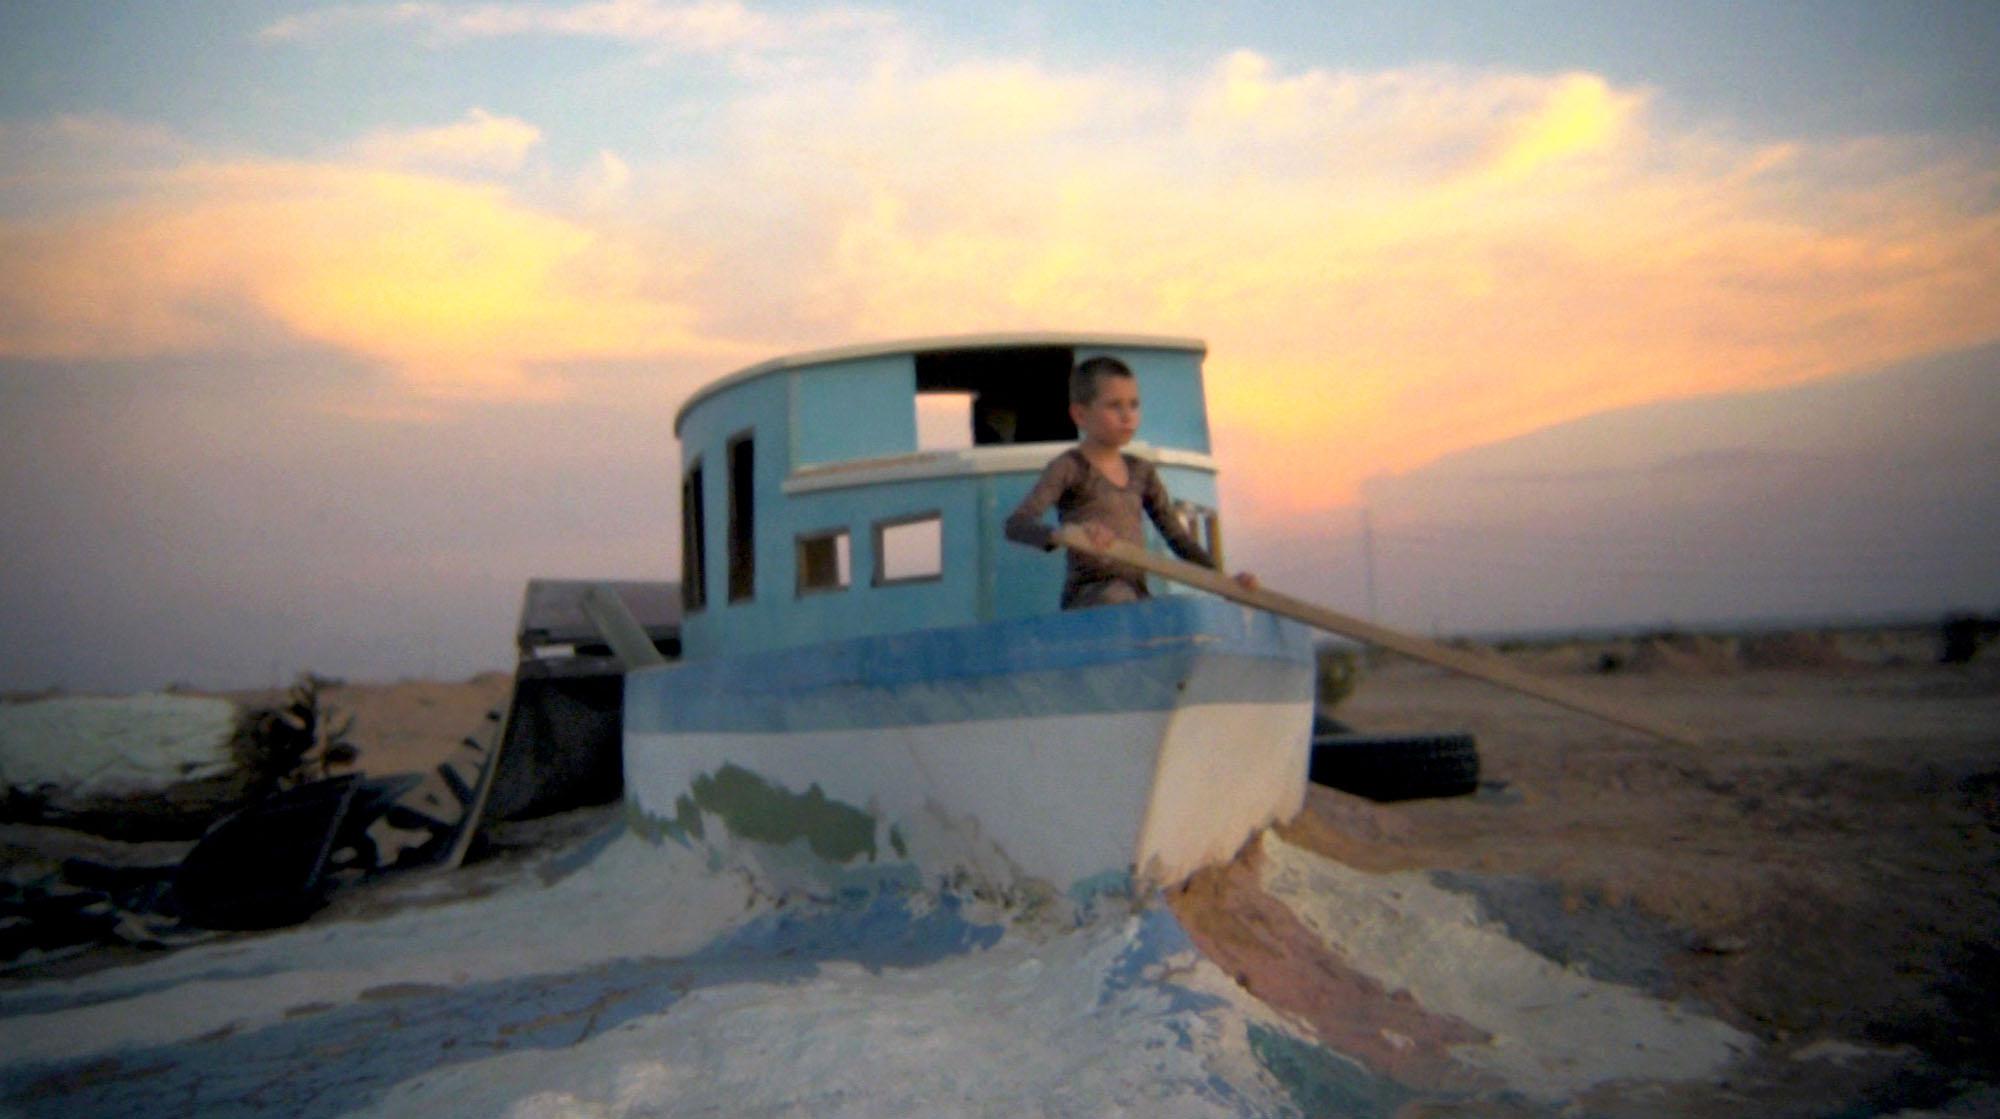 Alma Har'el Bombay Beach interview / Oh Comely